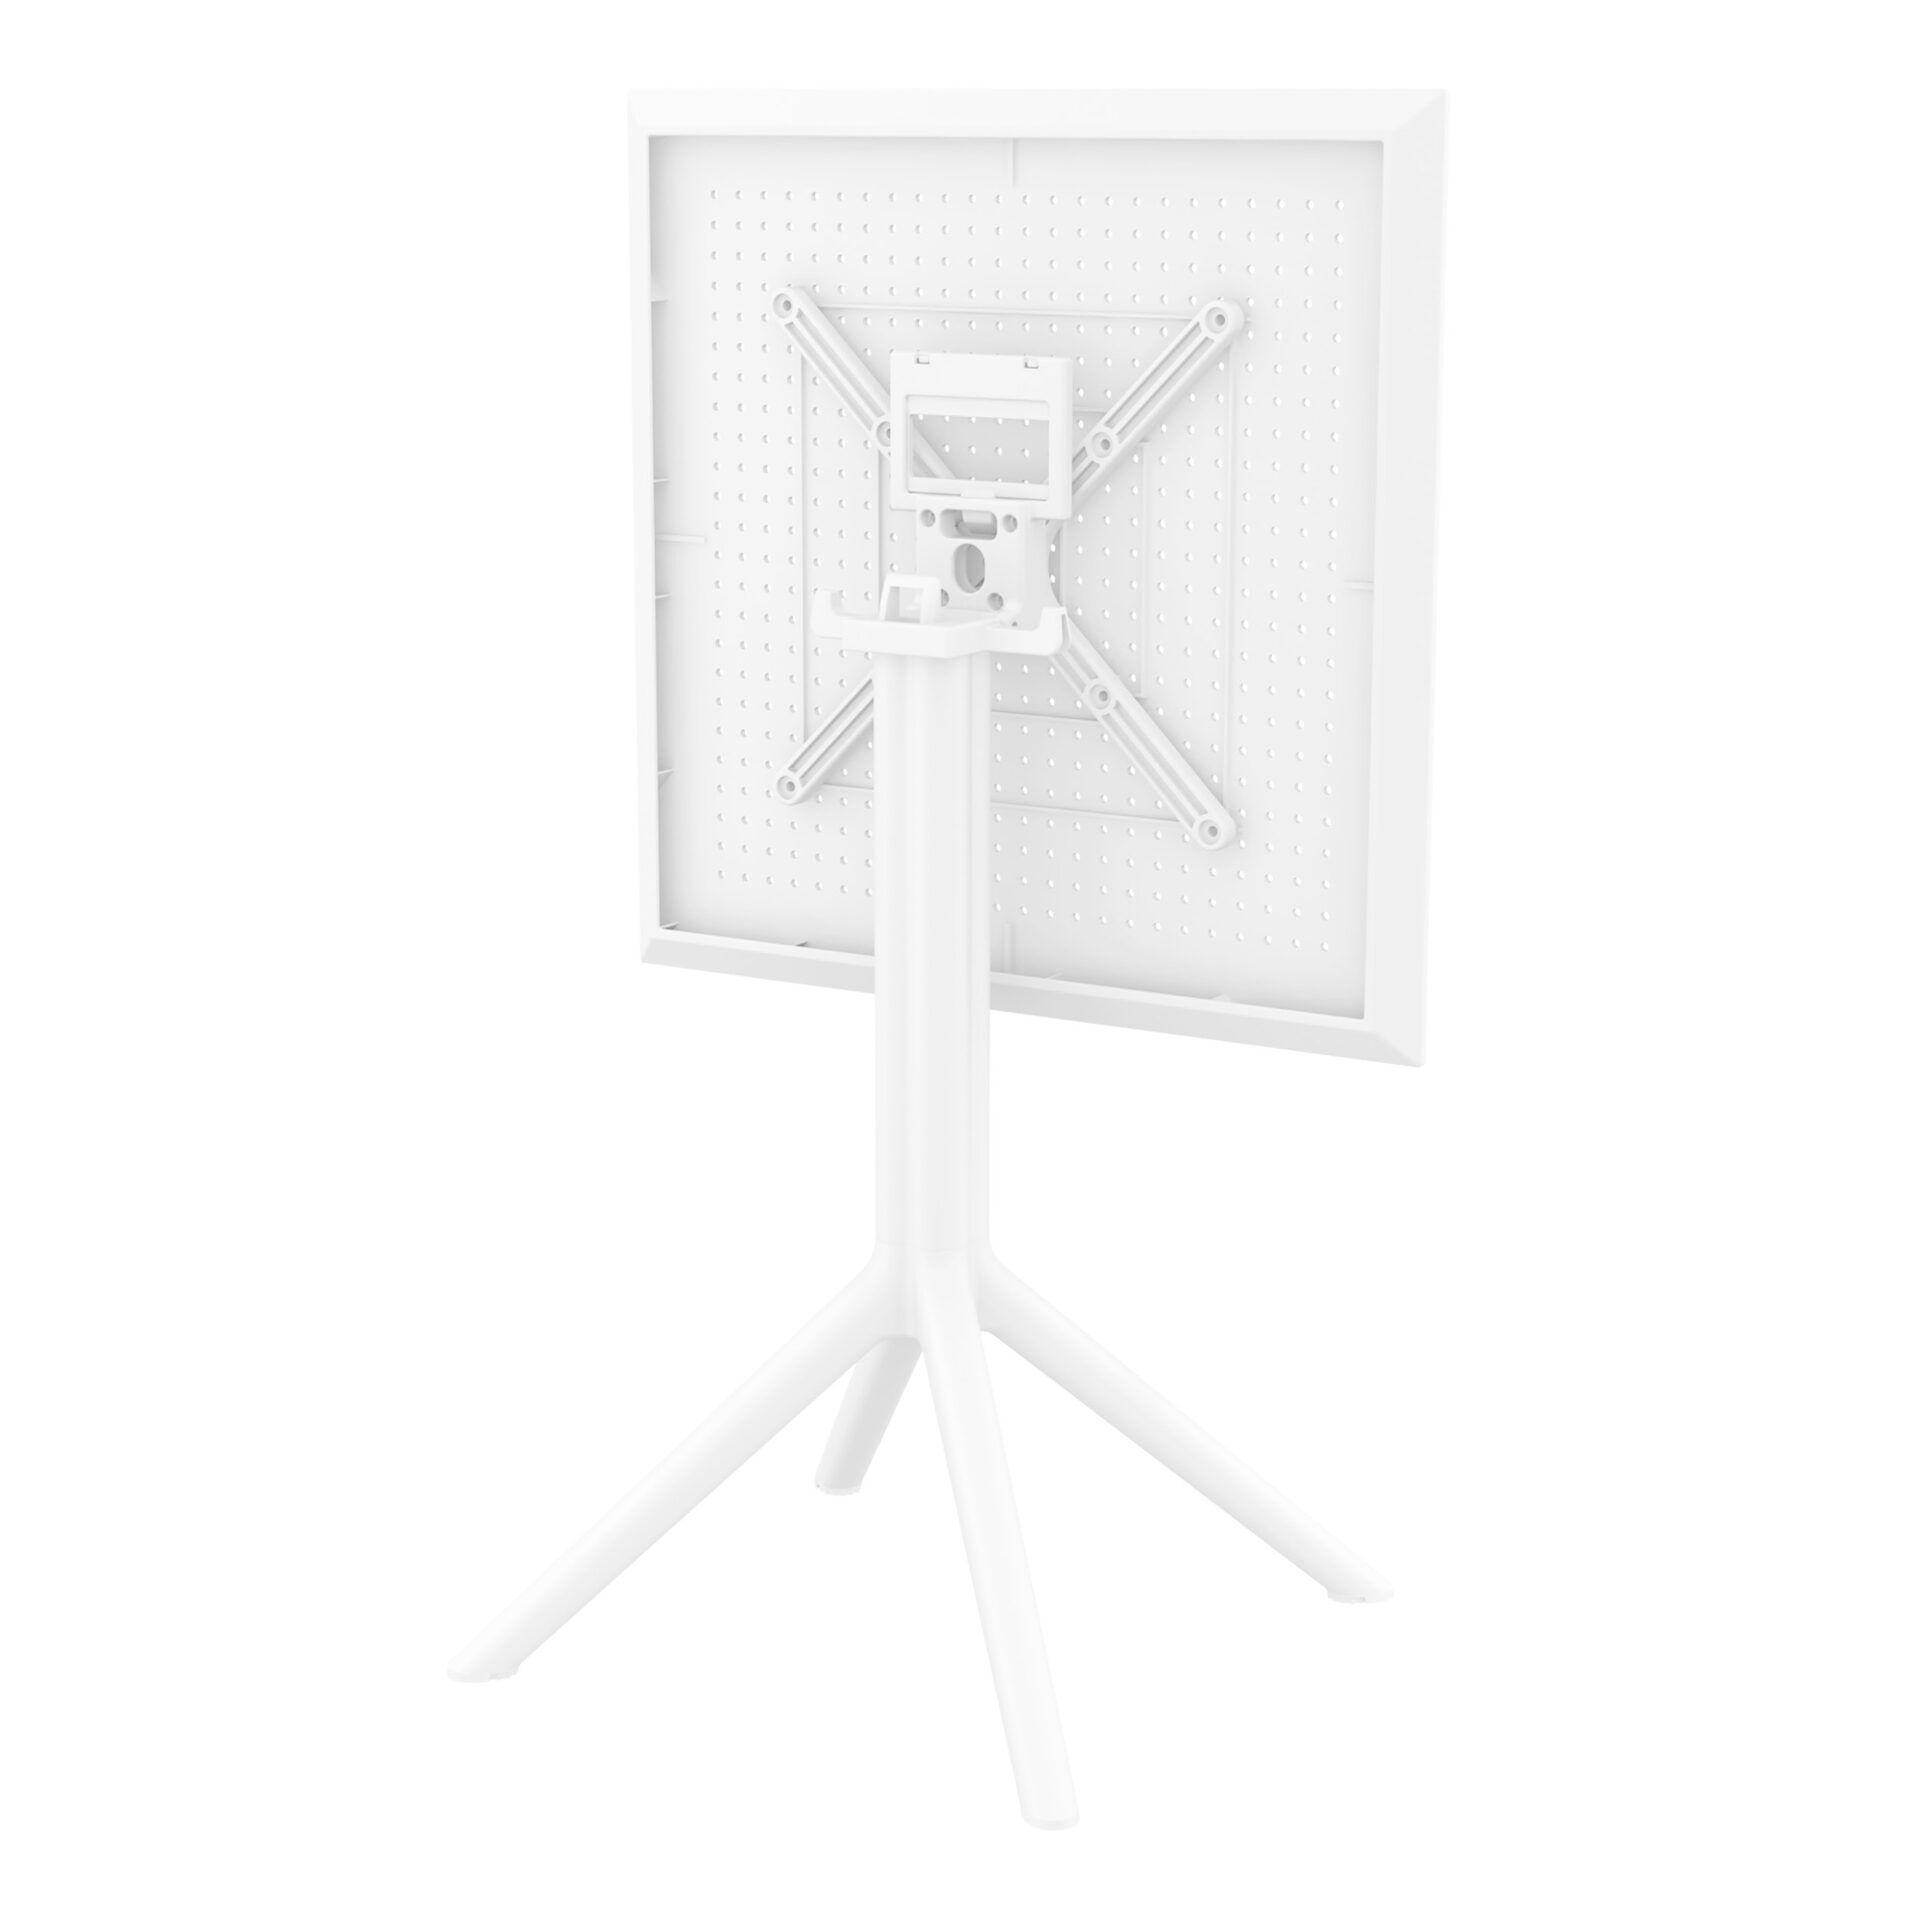 polypropylene outdoor sky folding bar table 60 white k back side